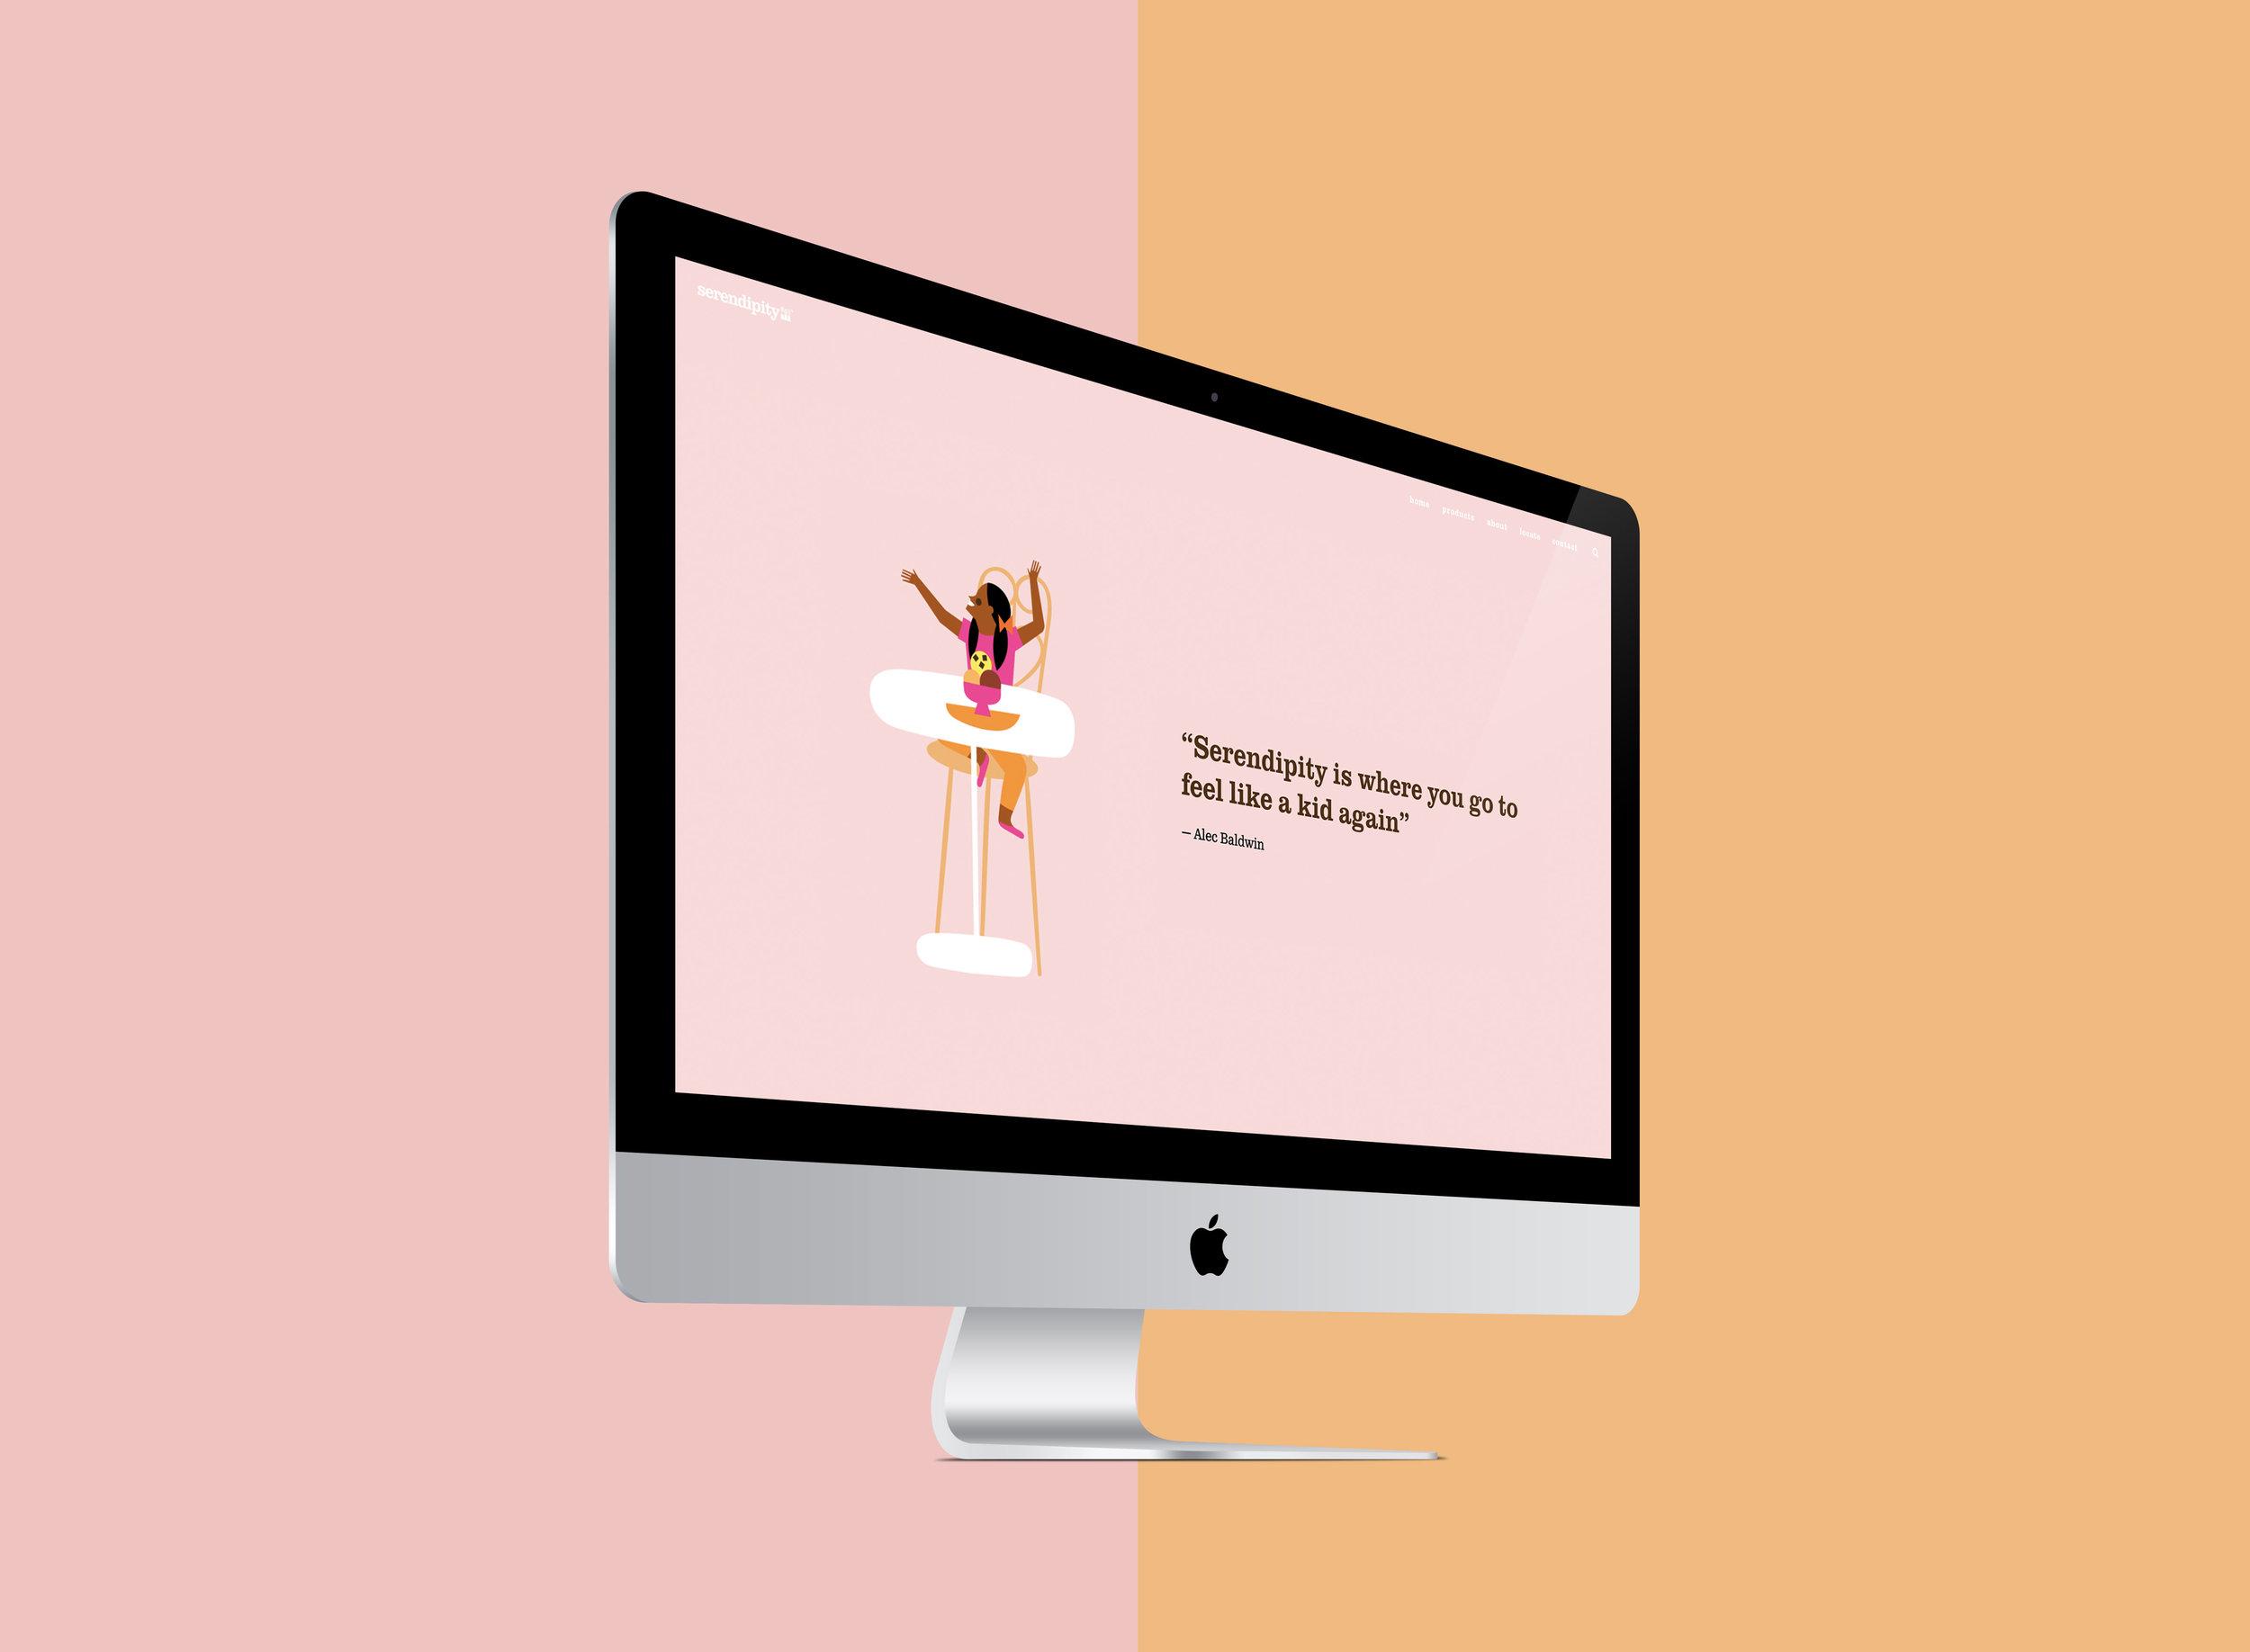 James-Rivas_Serendipity-Ice-Cream_desktop_website.jpg